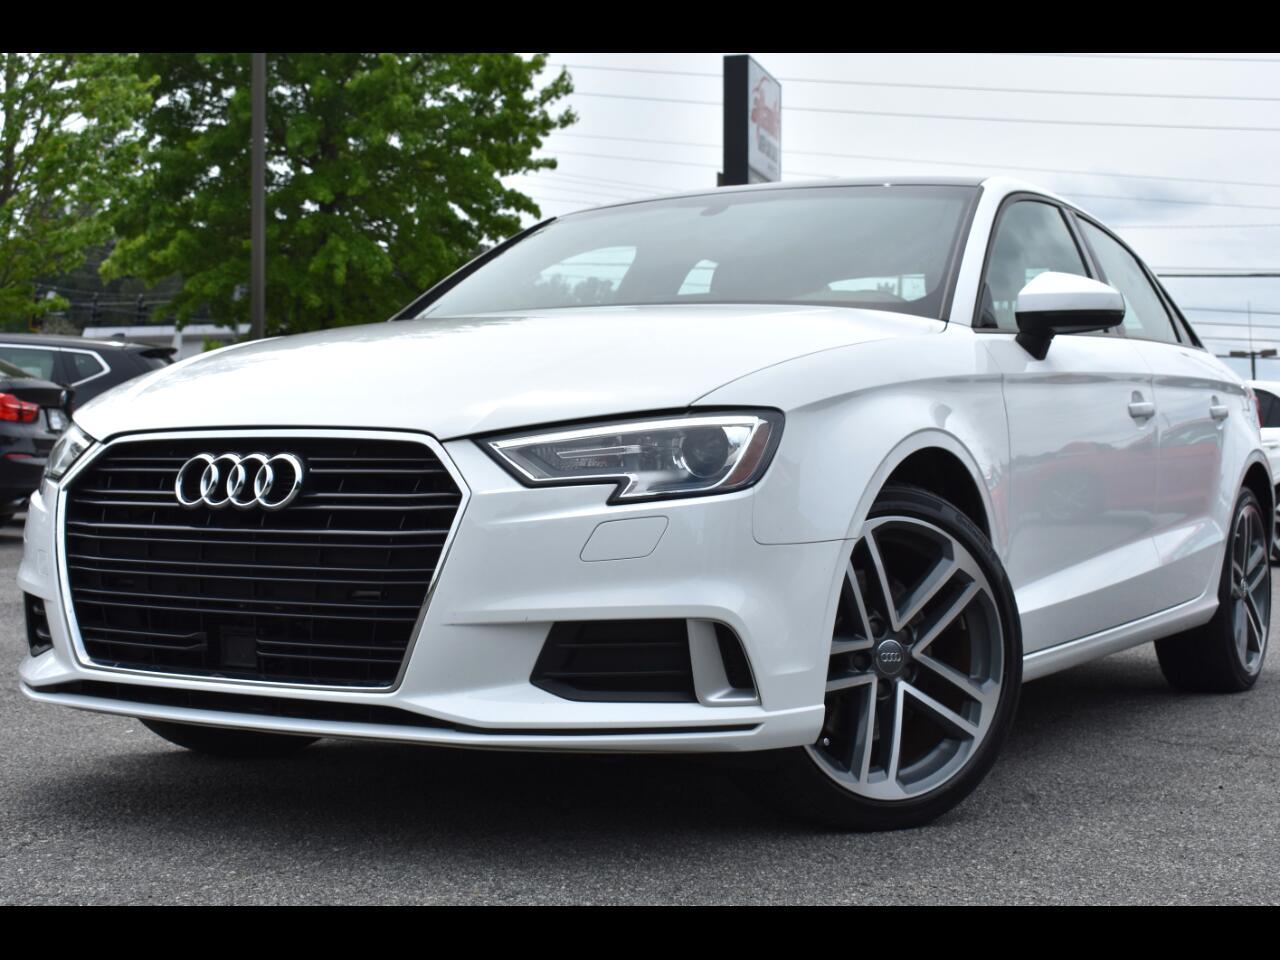 Audi A3 Premium 4D Sedan 2.0t 2018